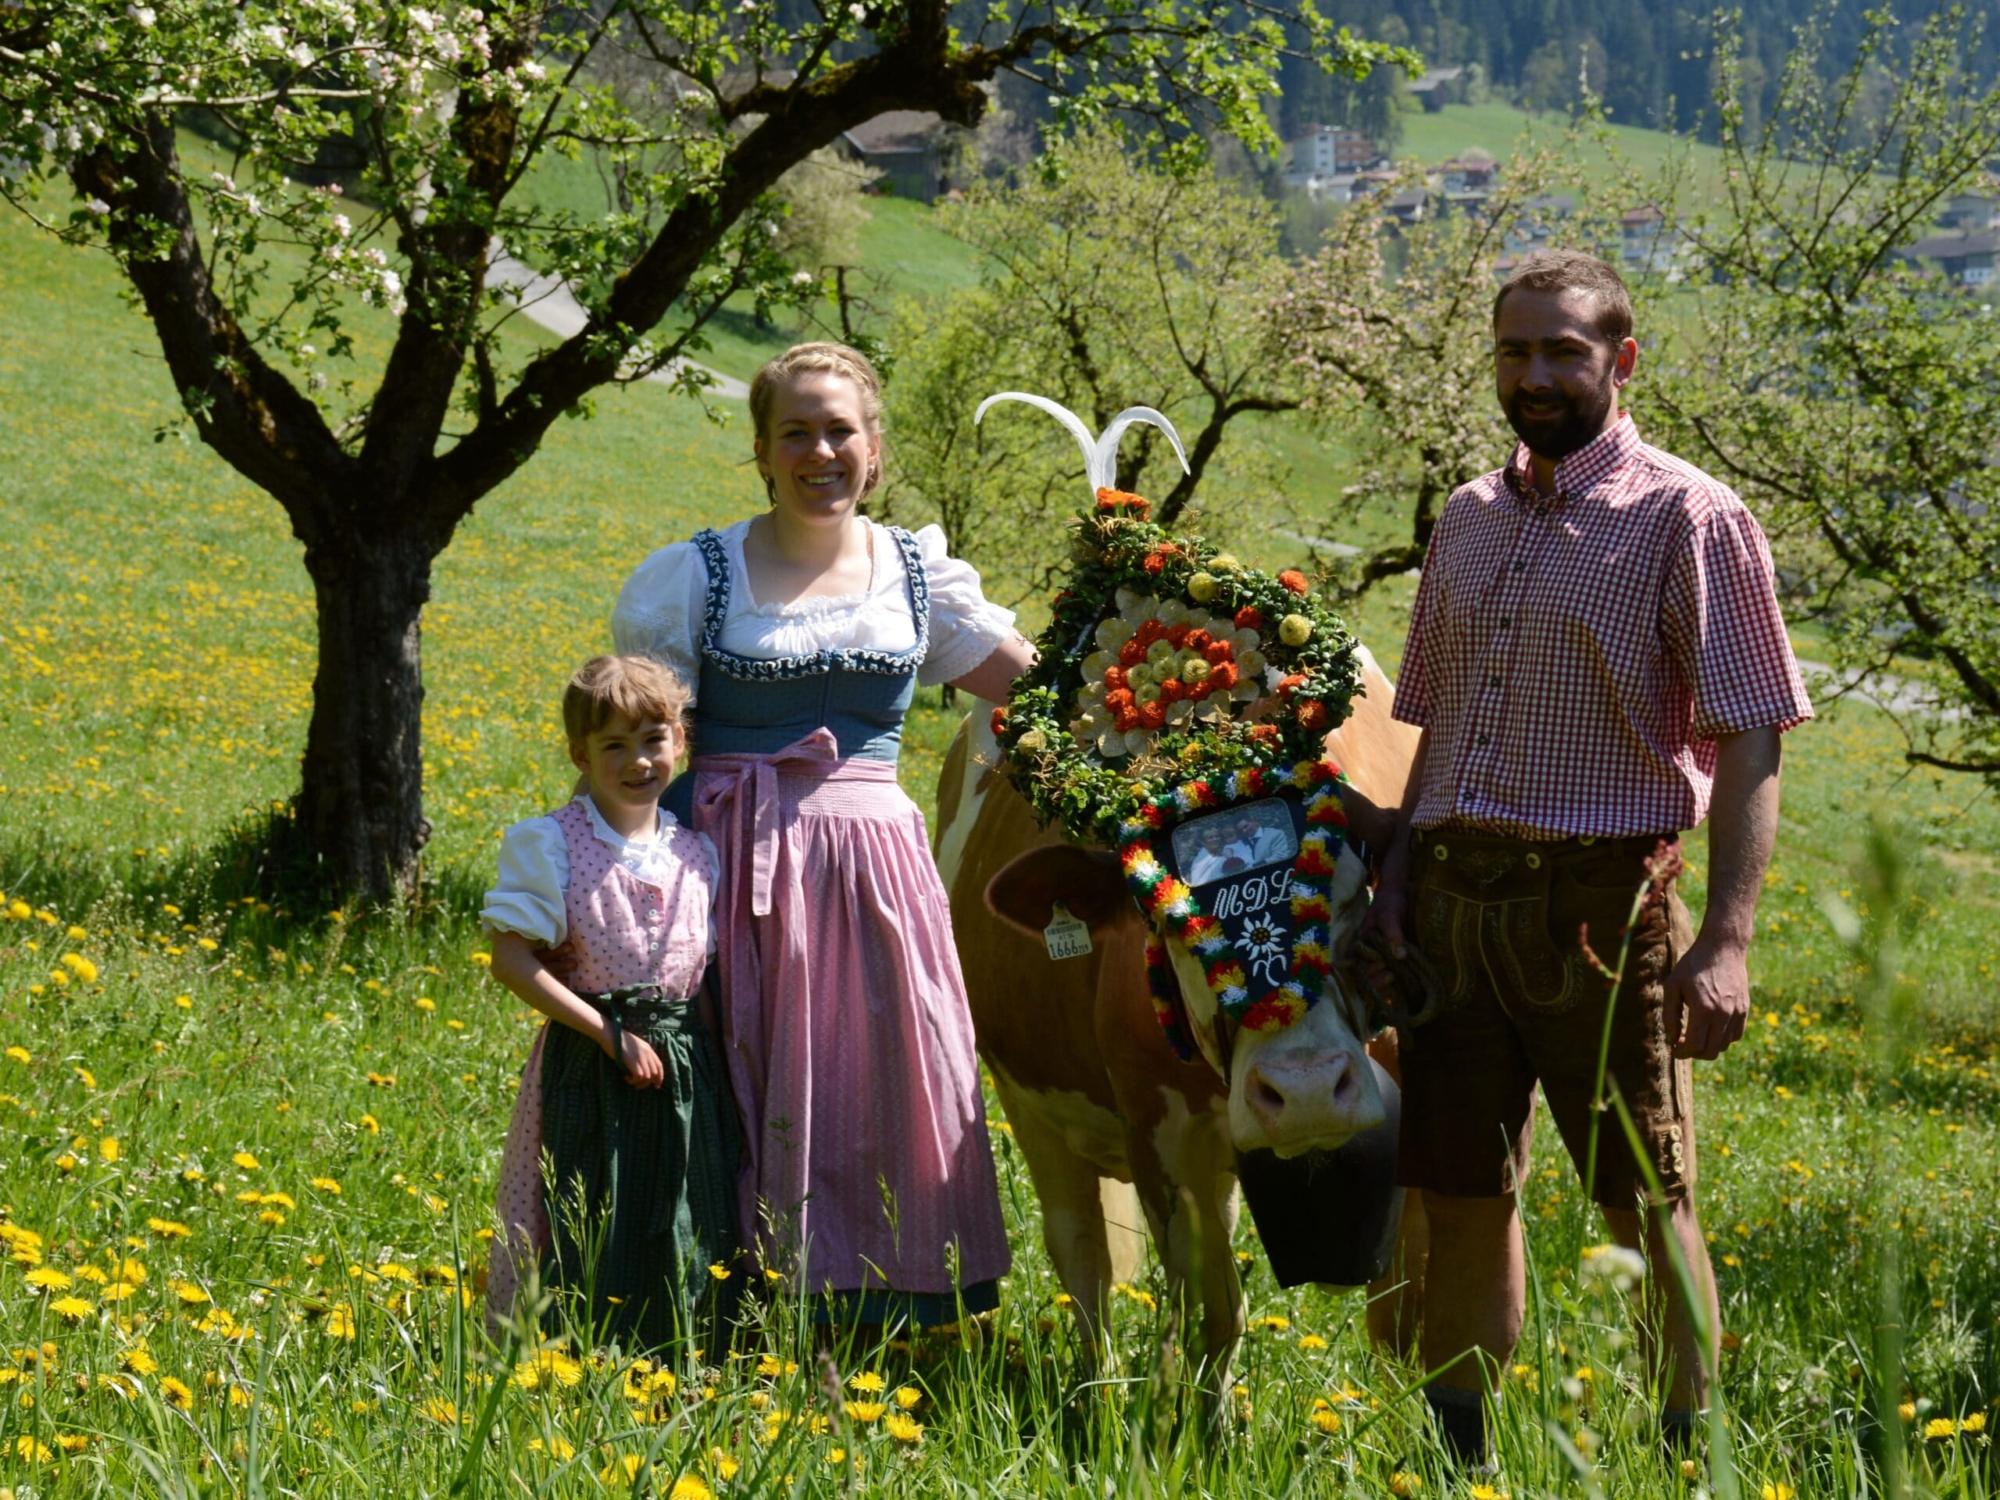 Binsalm, Karwendel, Almabtrieb, Wandern